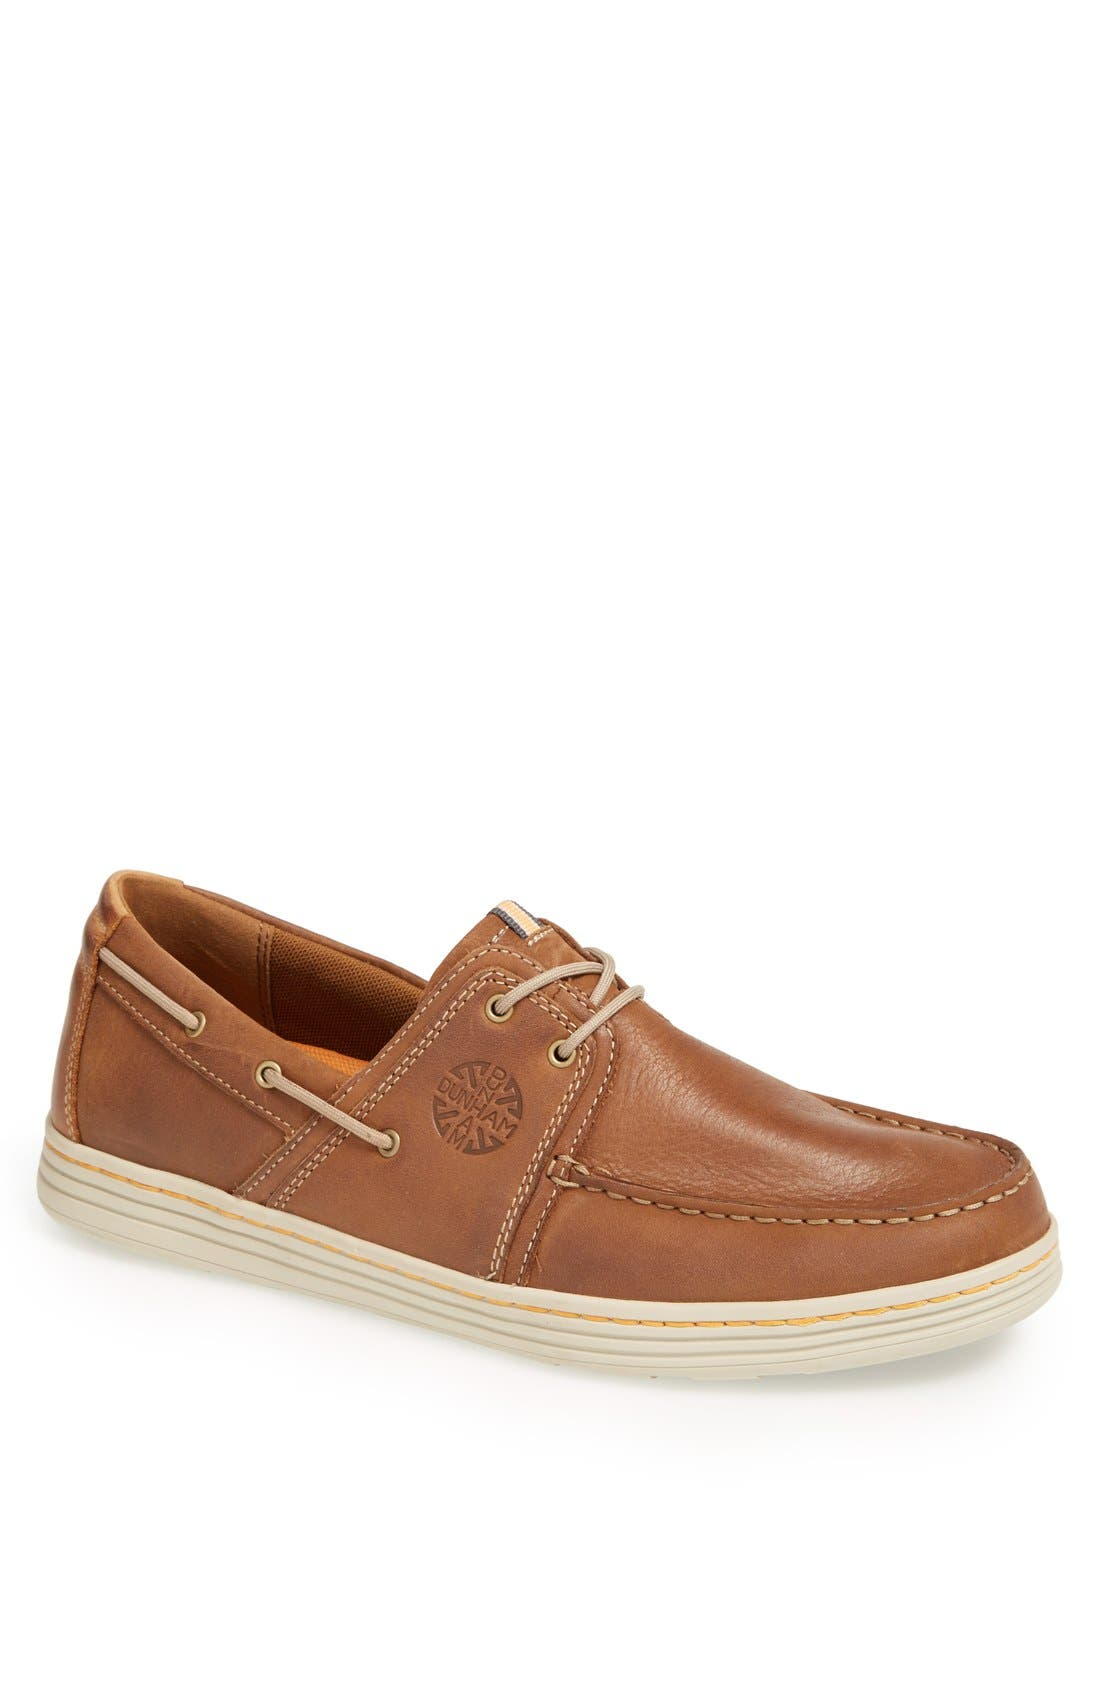 Main Image - Dunham 'Chace' Boat Shoe